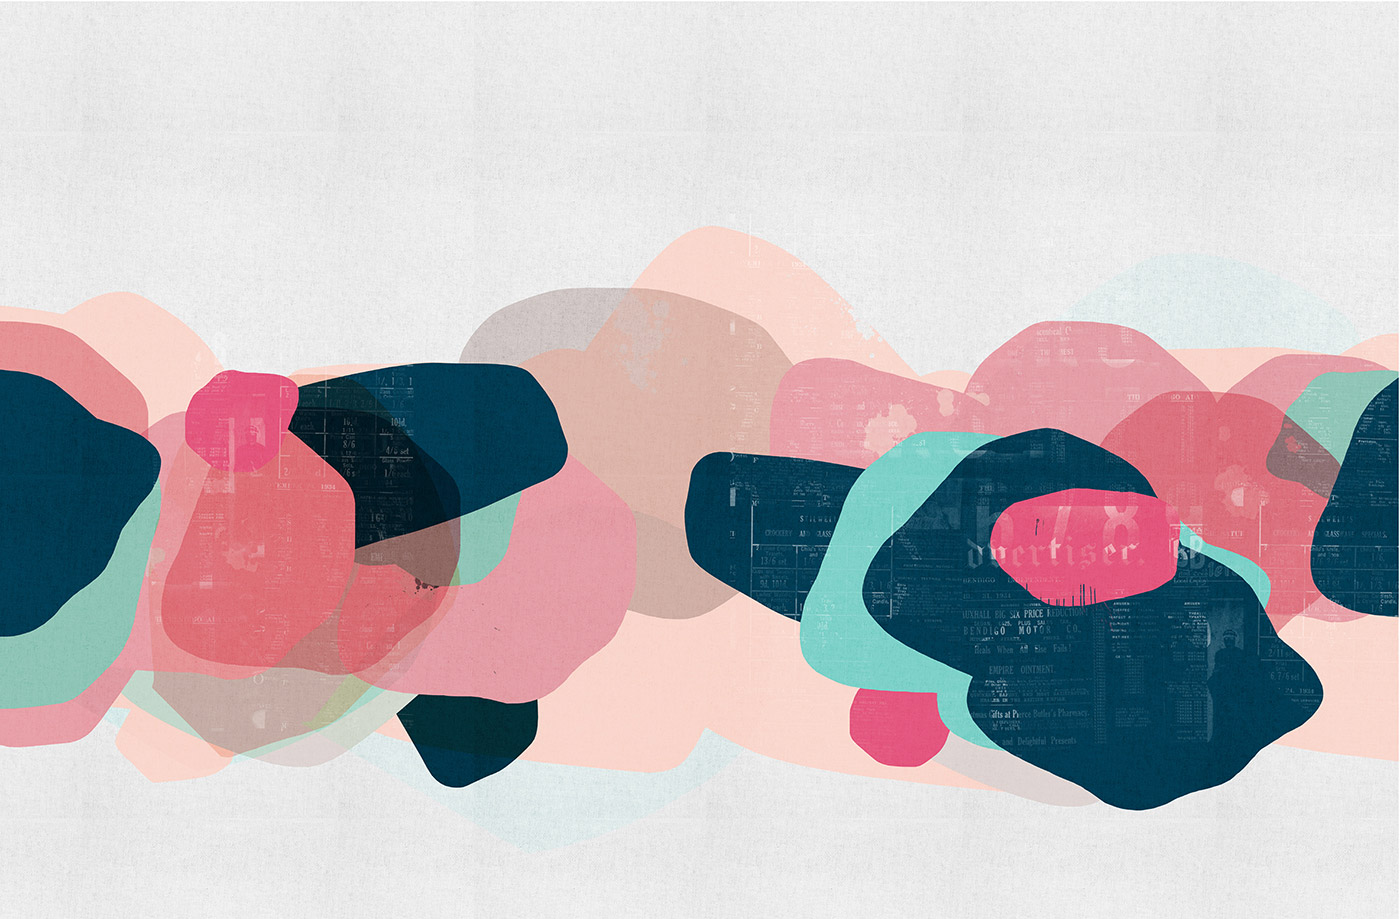 Dream Bay  , 2015   Pigment print on archival rag   95cm x 140cm / 1 of 15   65cm x 95cm / 1 of 50   50cm x 70cm / 1of 100